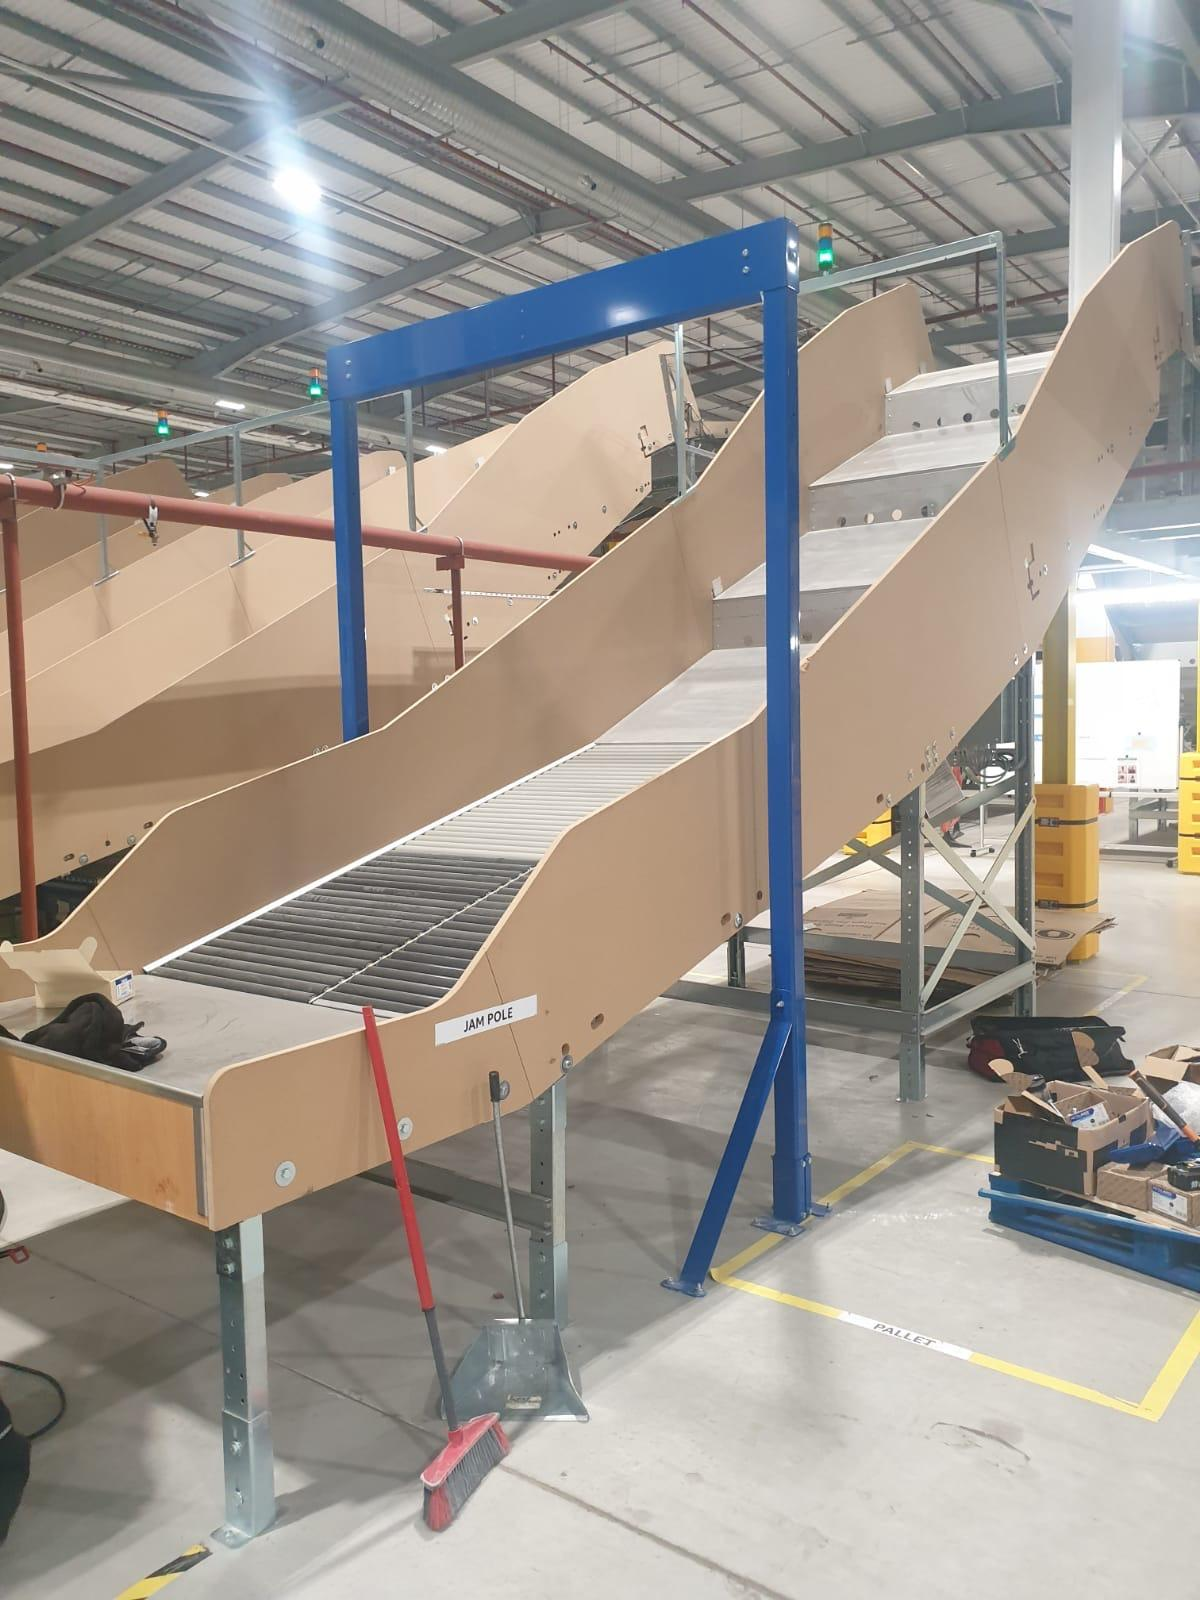 Bespoke Metal Fabrication at Amazon